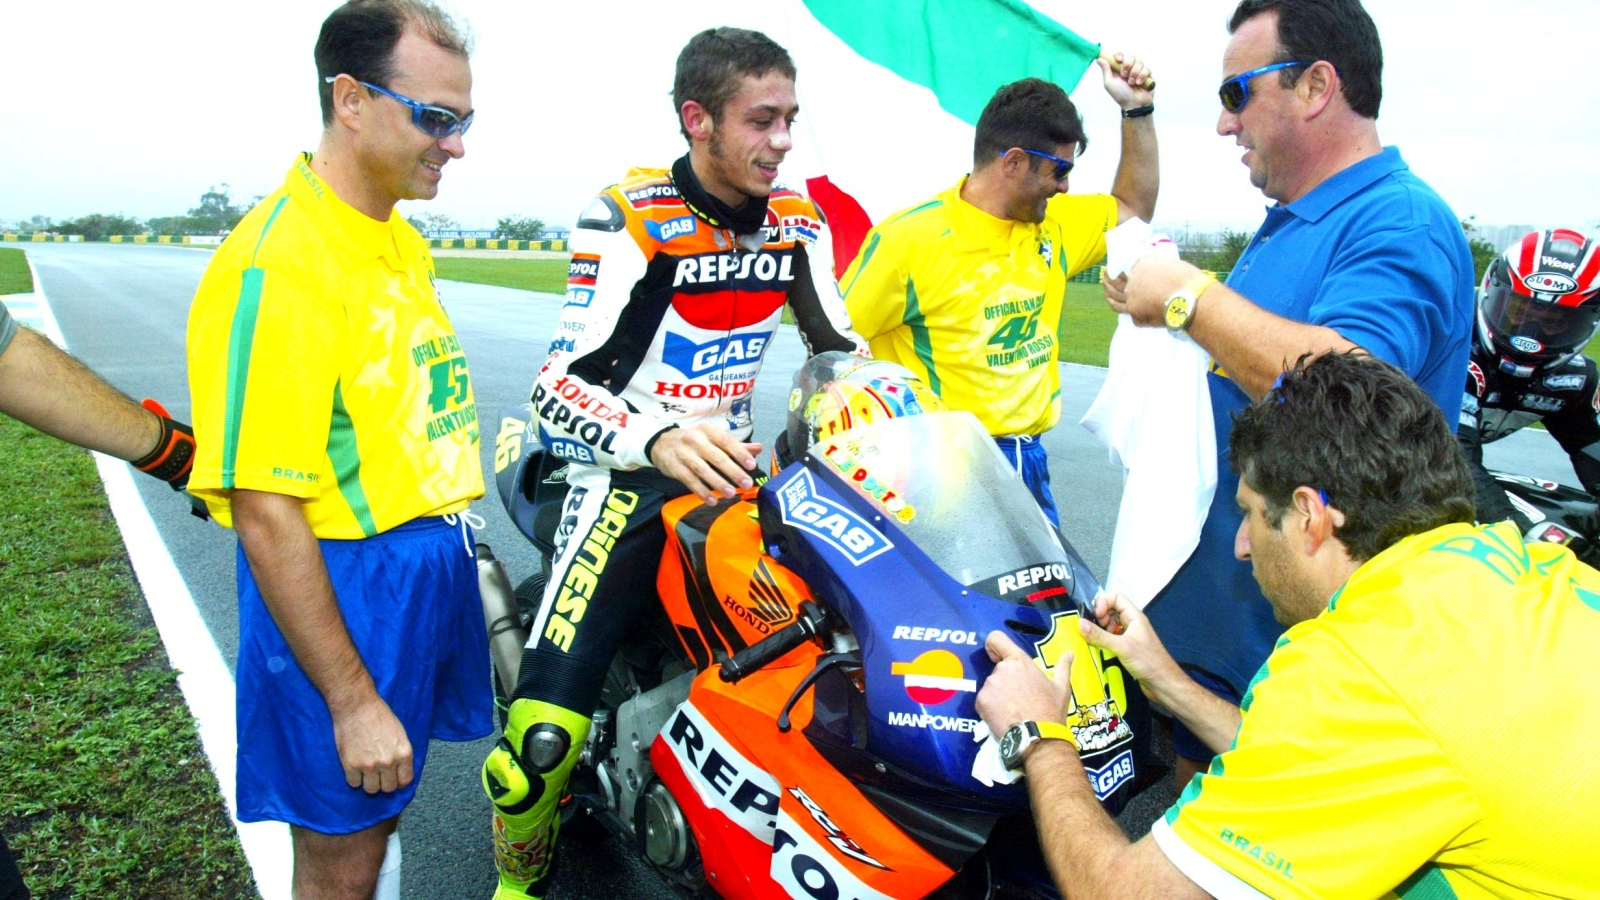 25 años Valentino Rossi: 2002 – Campeón MotoGP – Honda RC211V / Repsol Honda Team